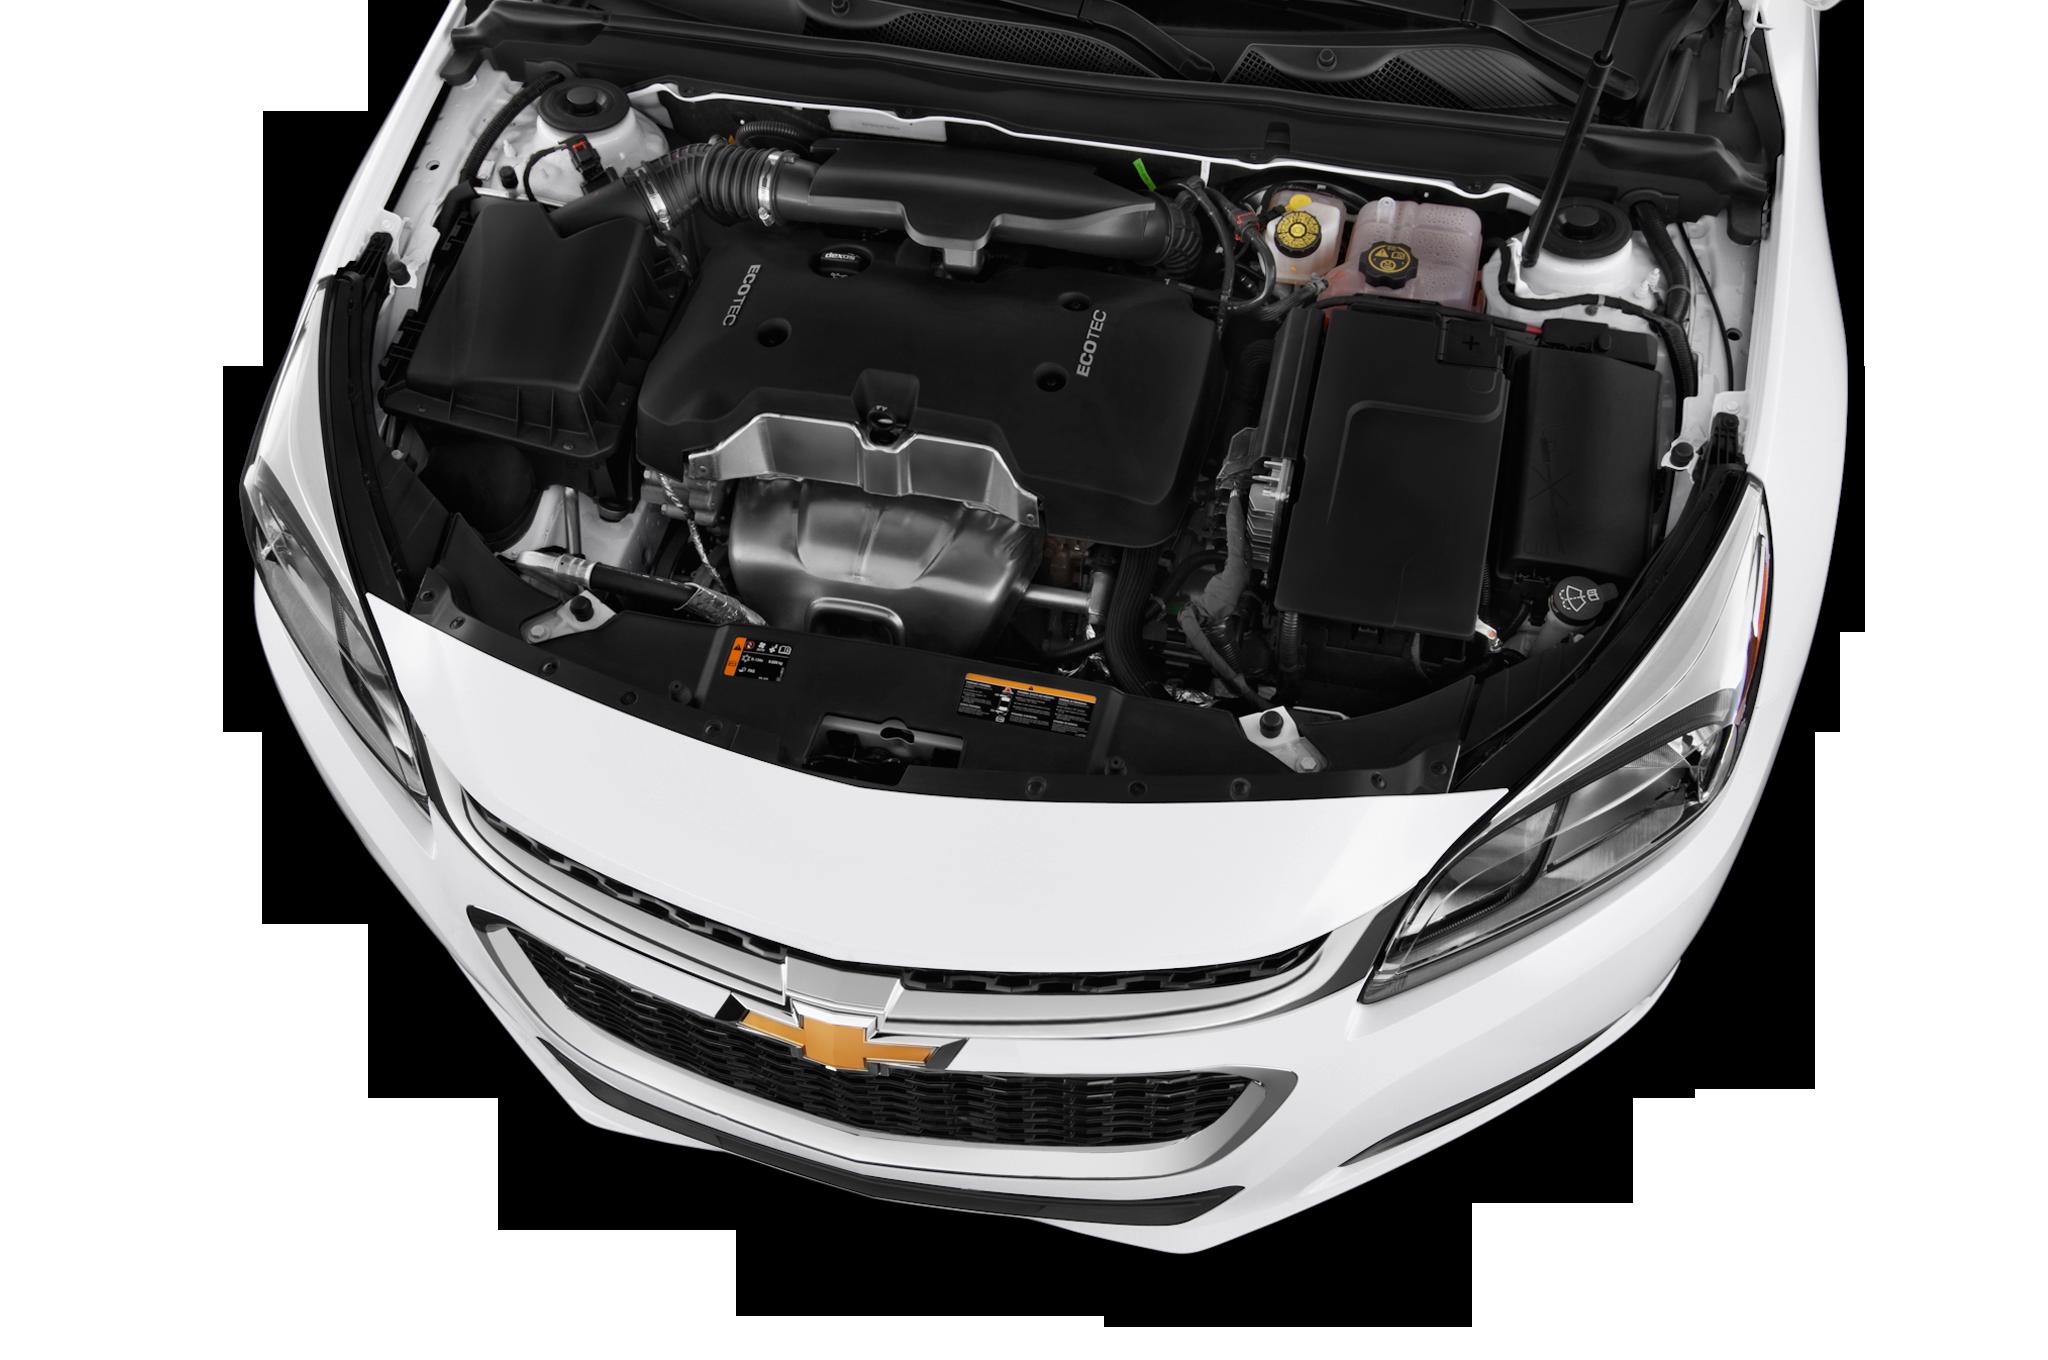 Gm Launches Extensive New Ecotec Engine Family Automobile Magazine 60 250